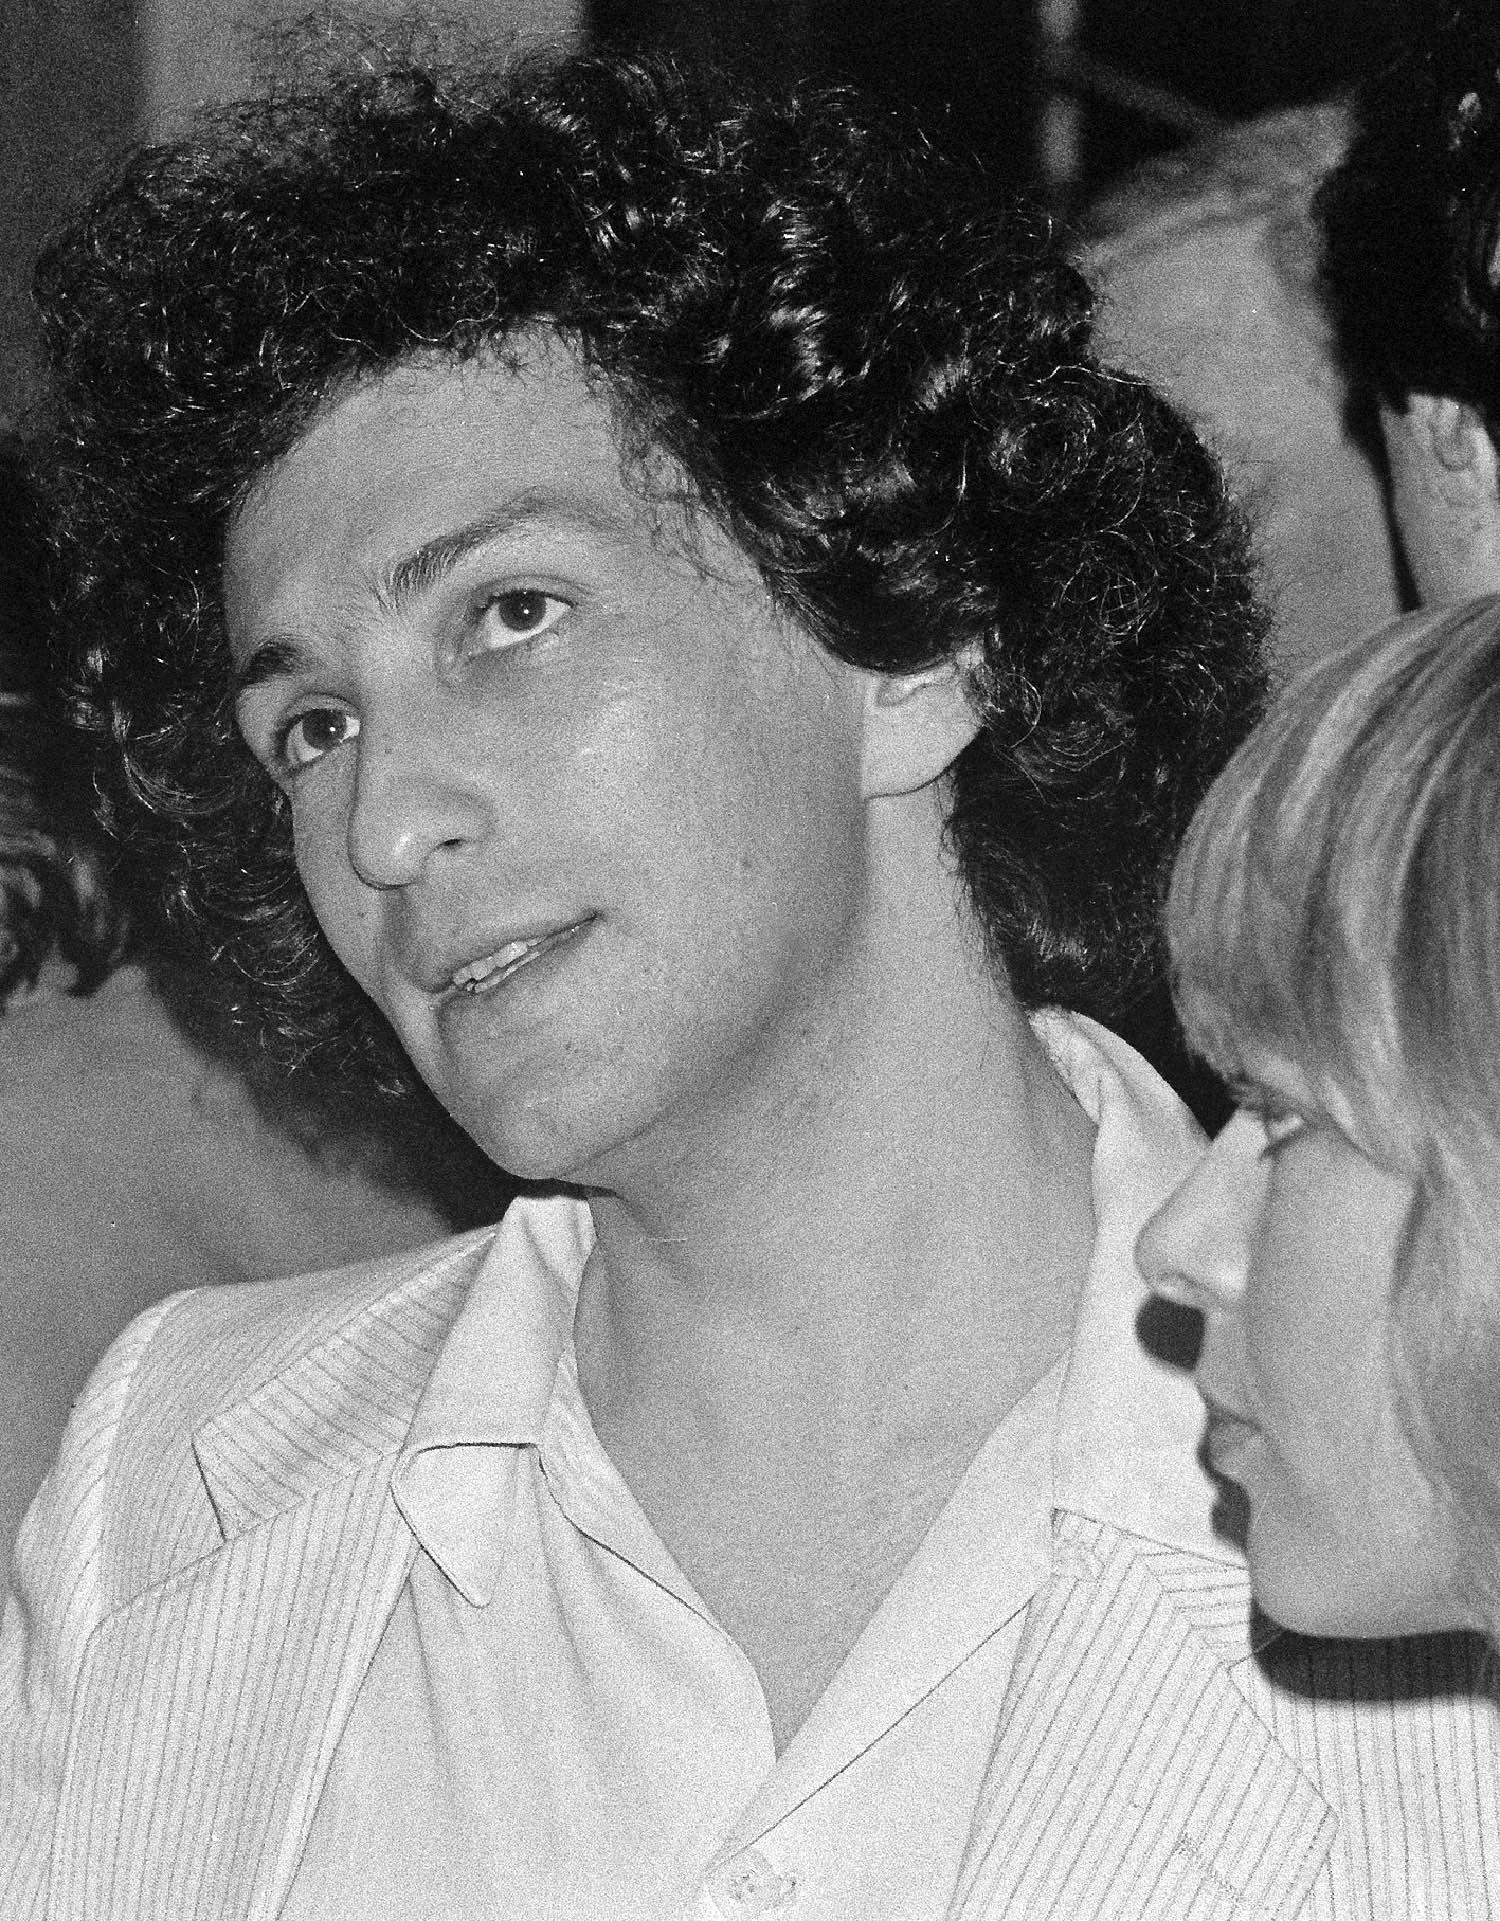 Michel Berger et France Gall | Geneve 1978 | Television suisse romande | photo sandrine cohen